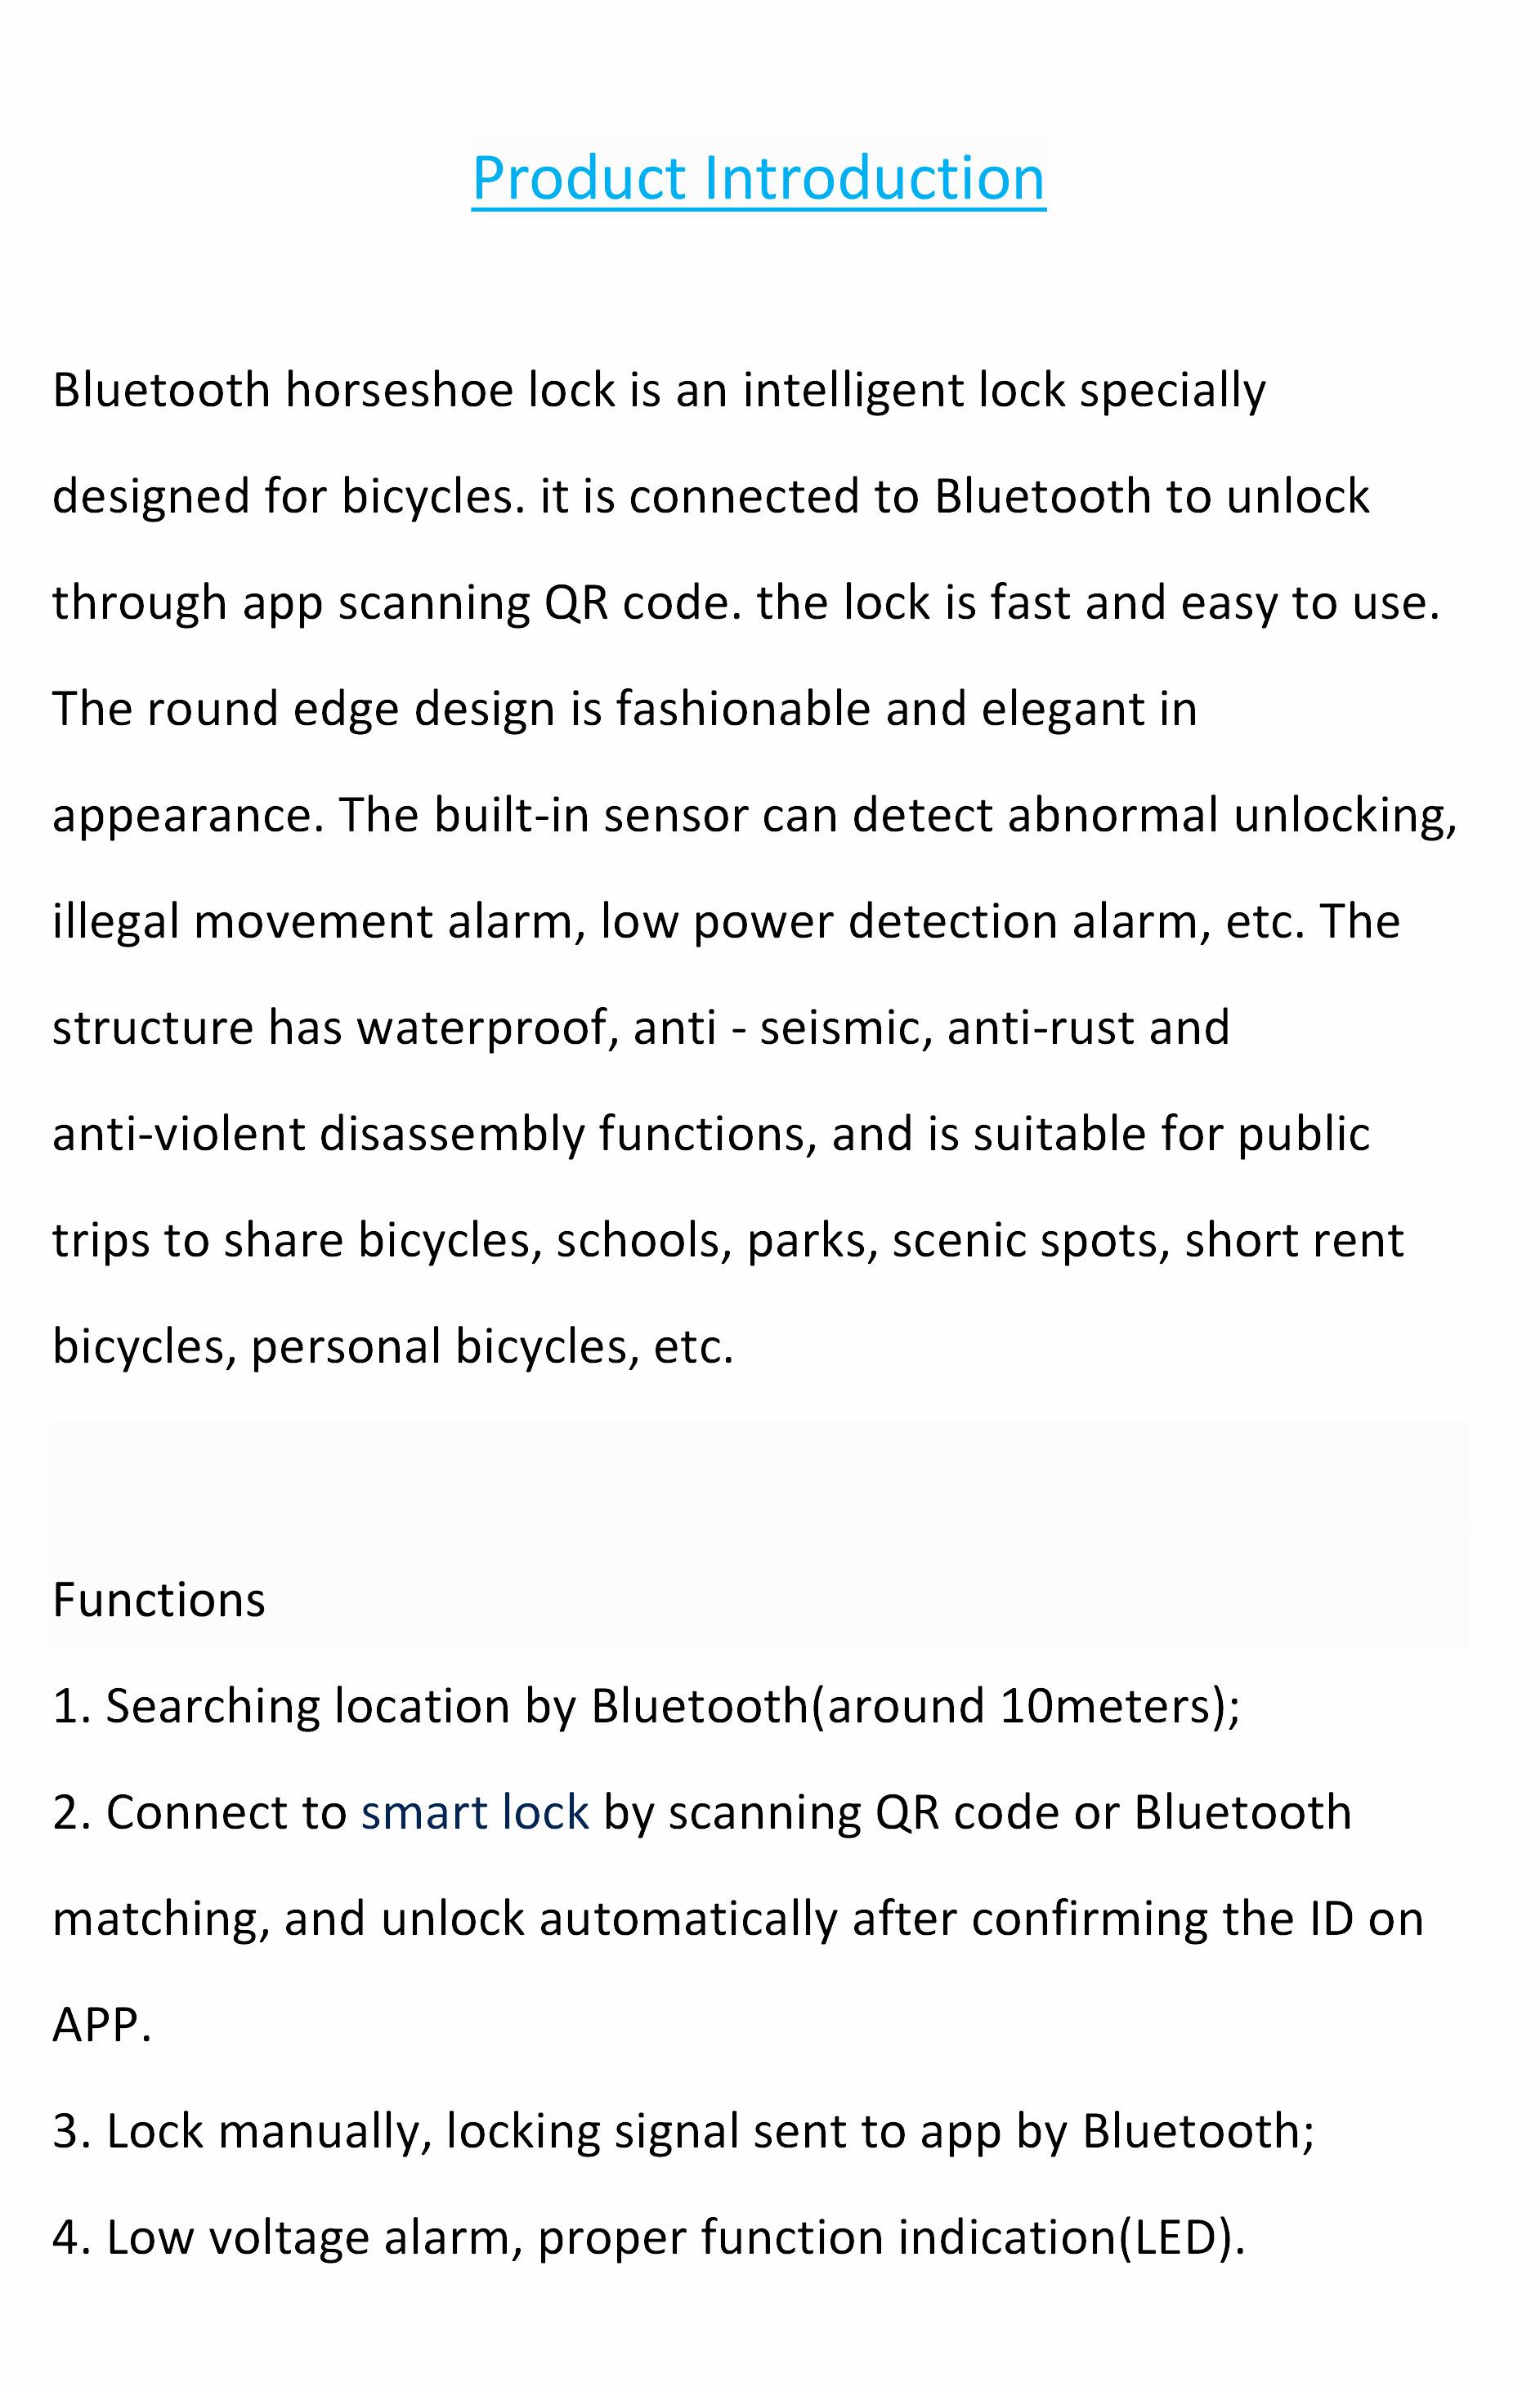 Microsoft Word - Shared bicycle lock.doc